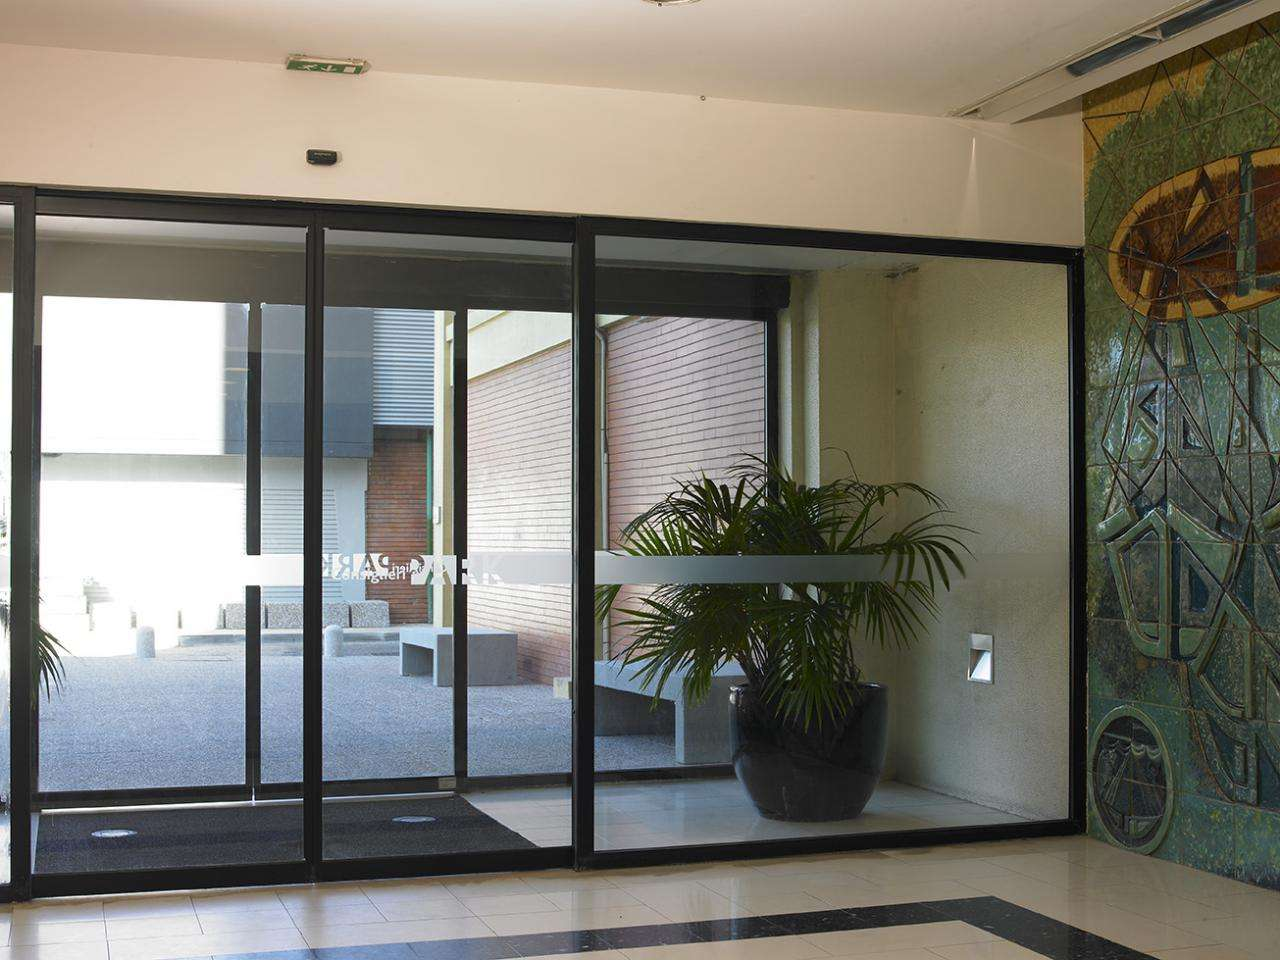 Escritório para arrendar, Barcarena, Lisboa - Foto 10